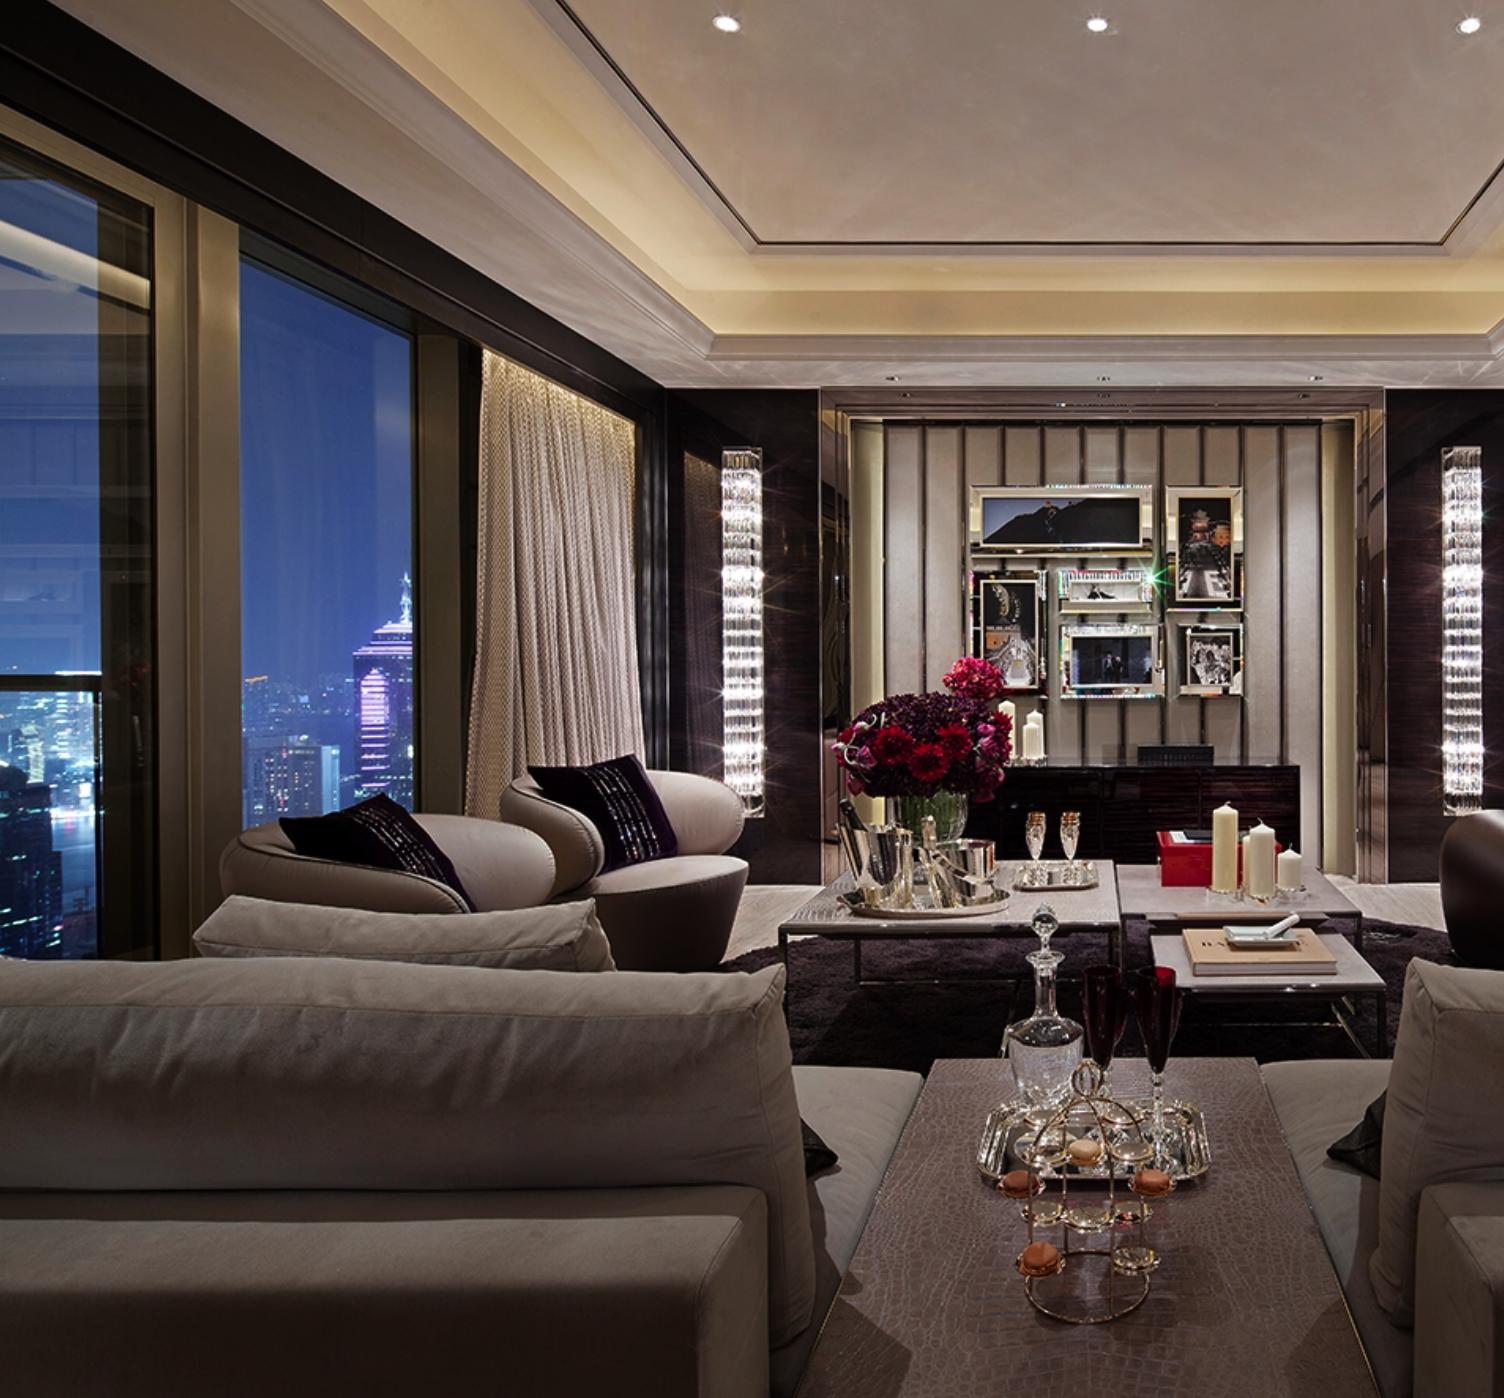 Home Decor 2012 Luxury Homes Interior Decoration Living: Luxury Living Room, Luxury Interior, Luxury